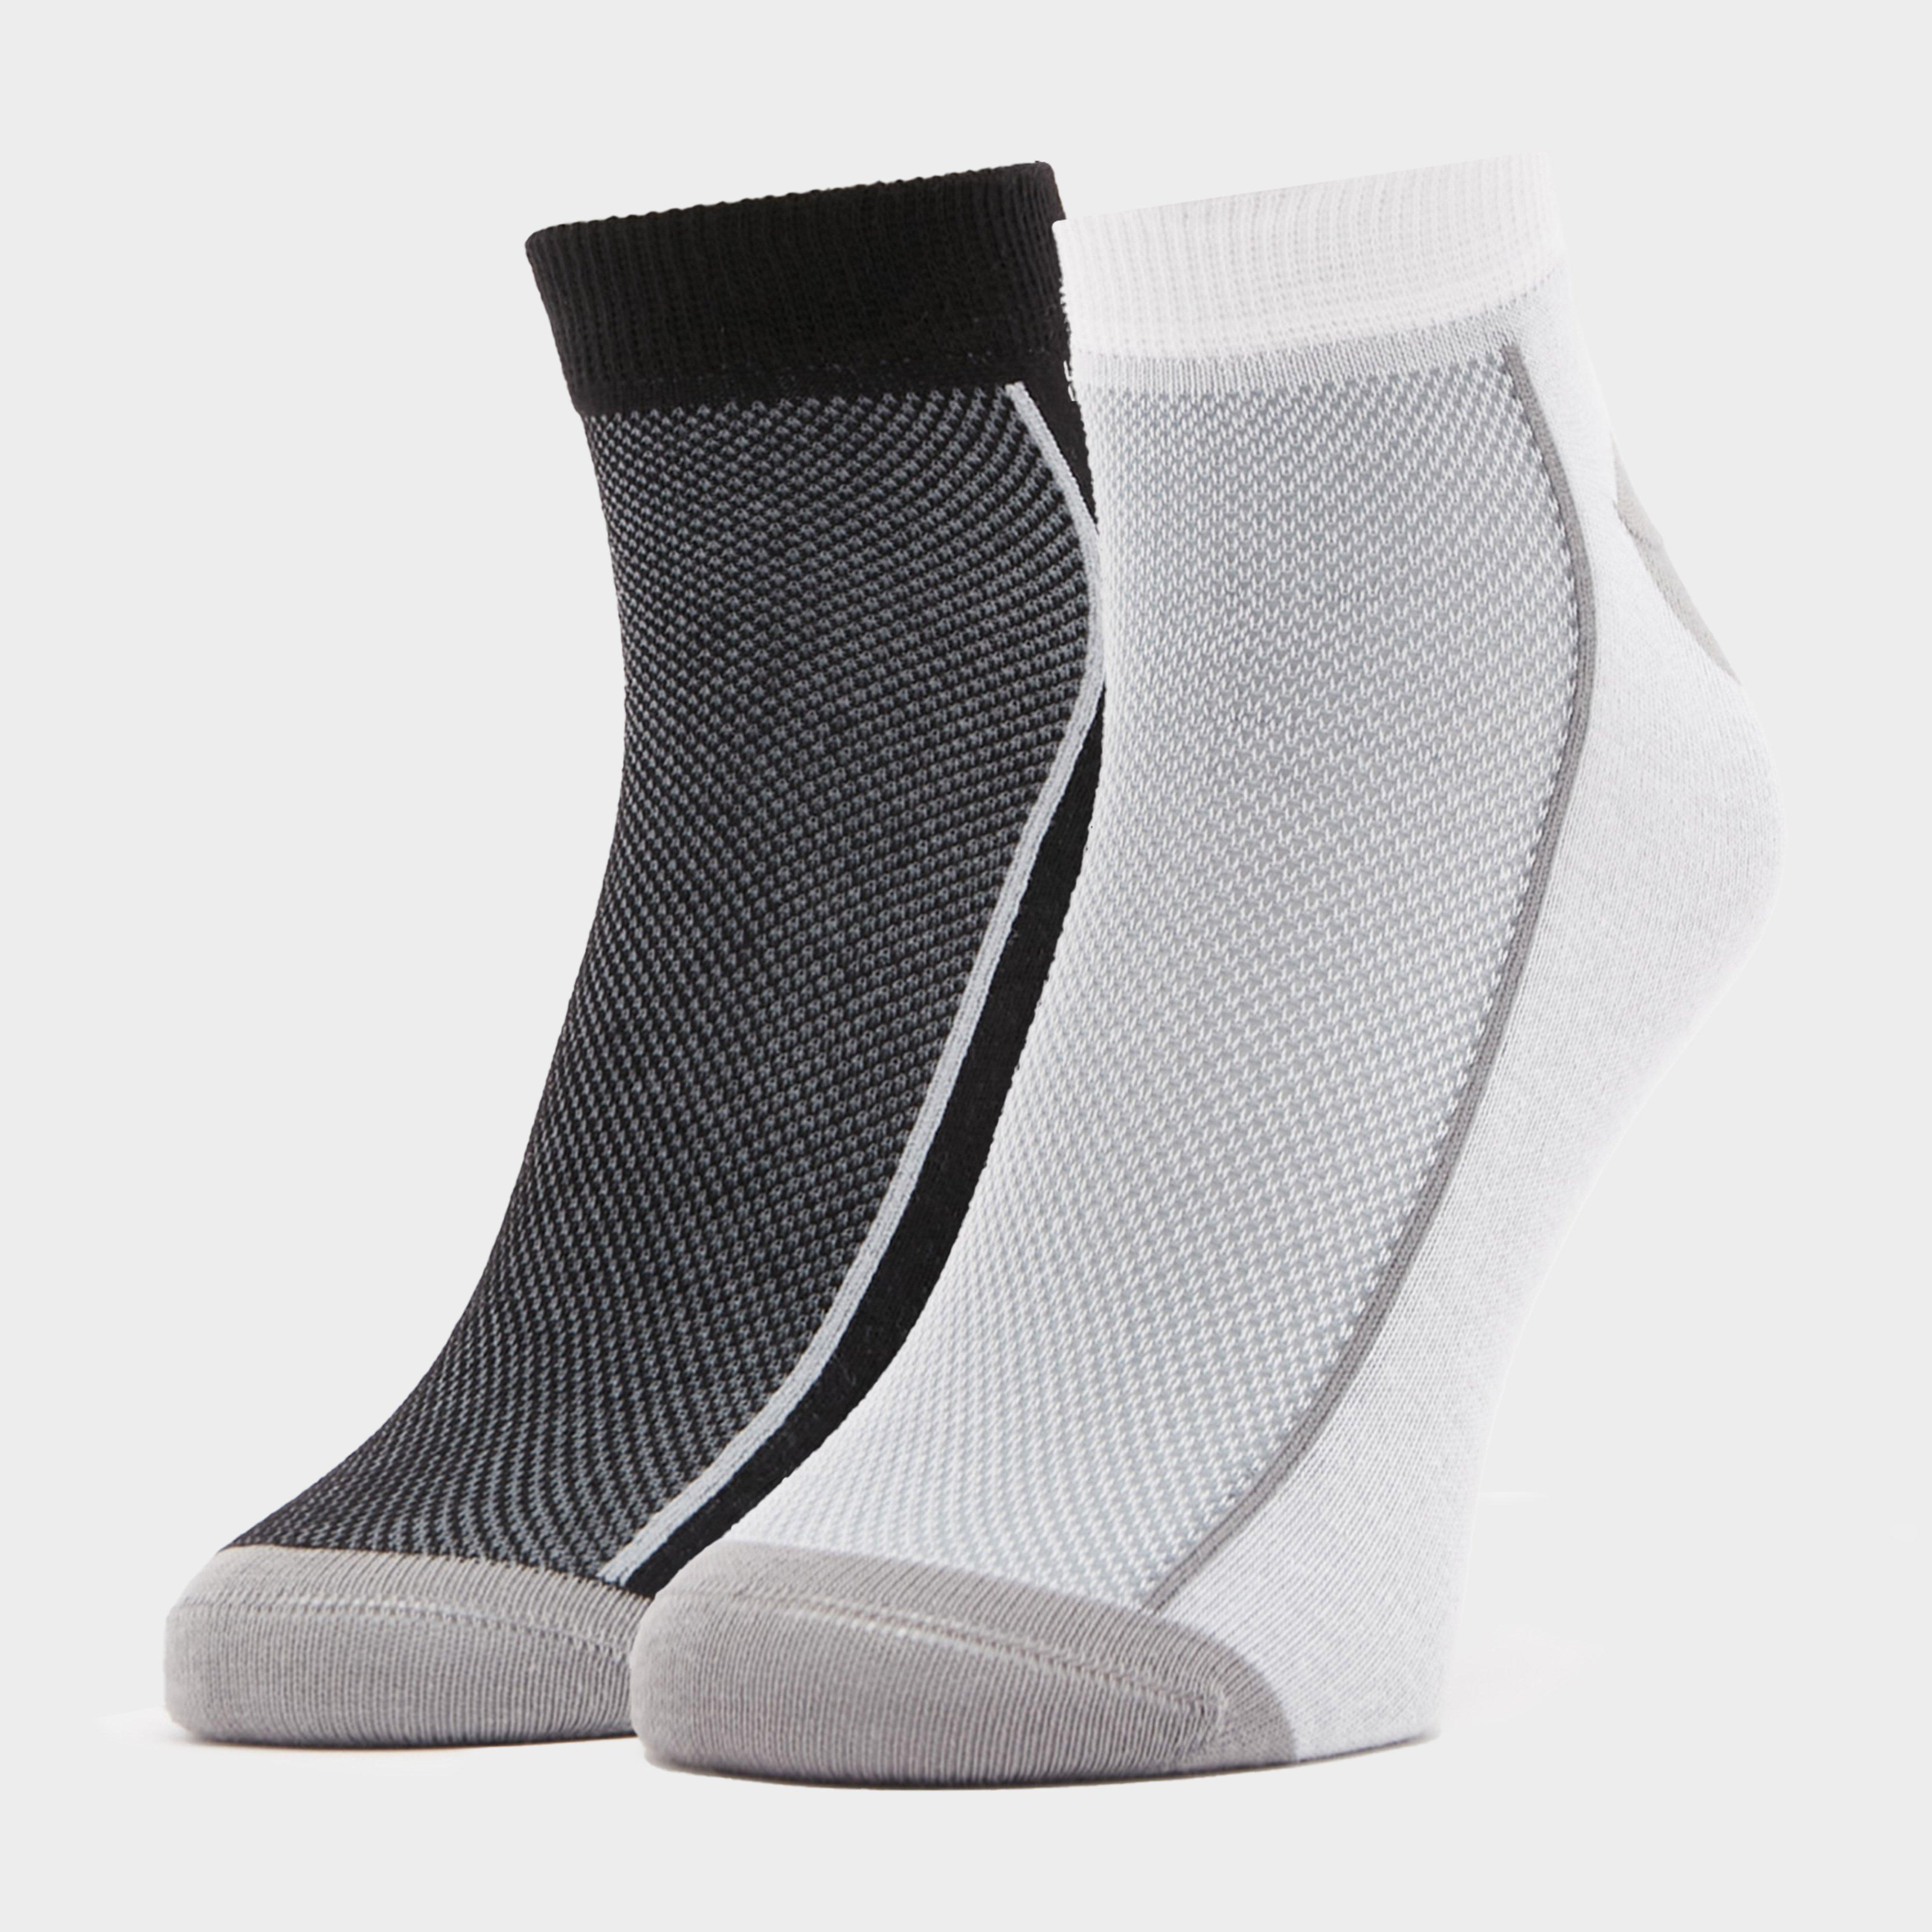 Samuel Eden Go Running - Grey/sock  Grey/sock